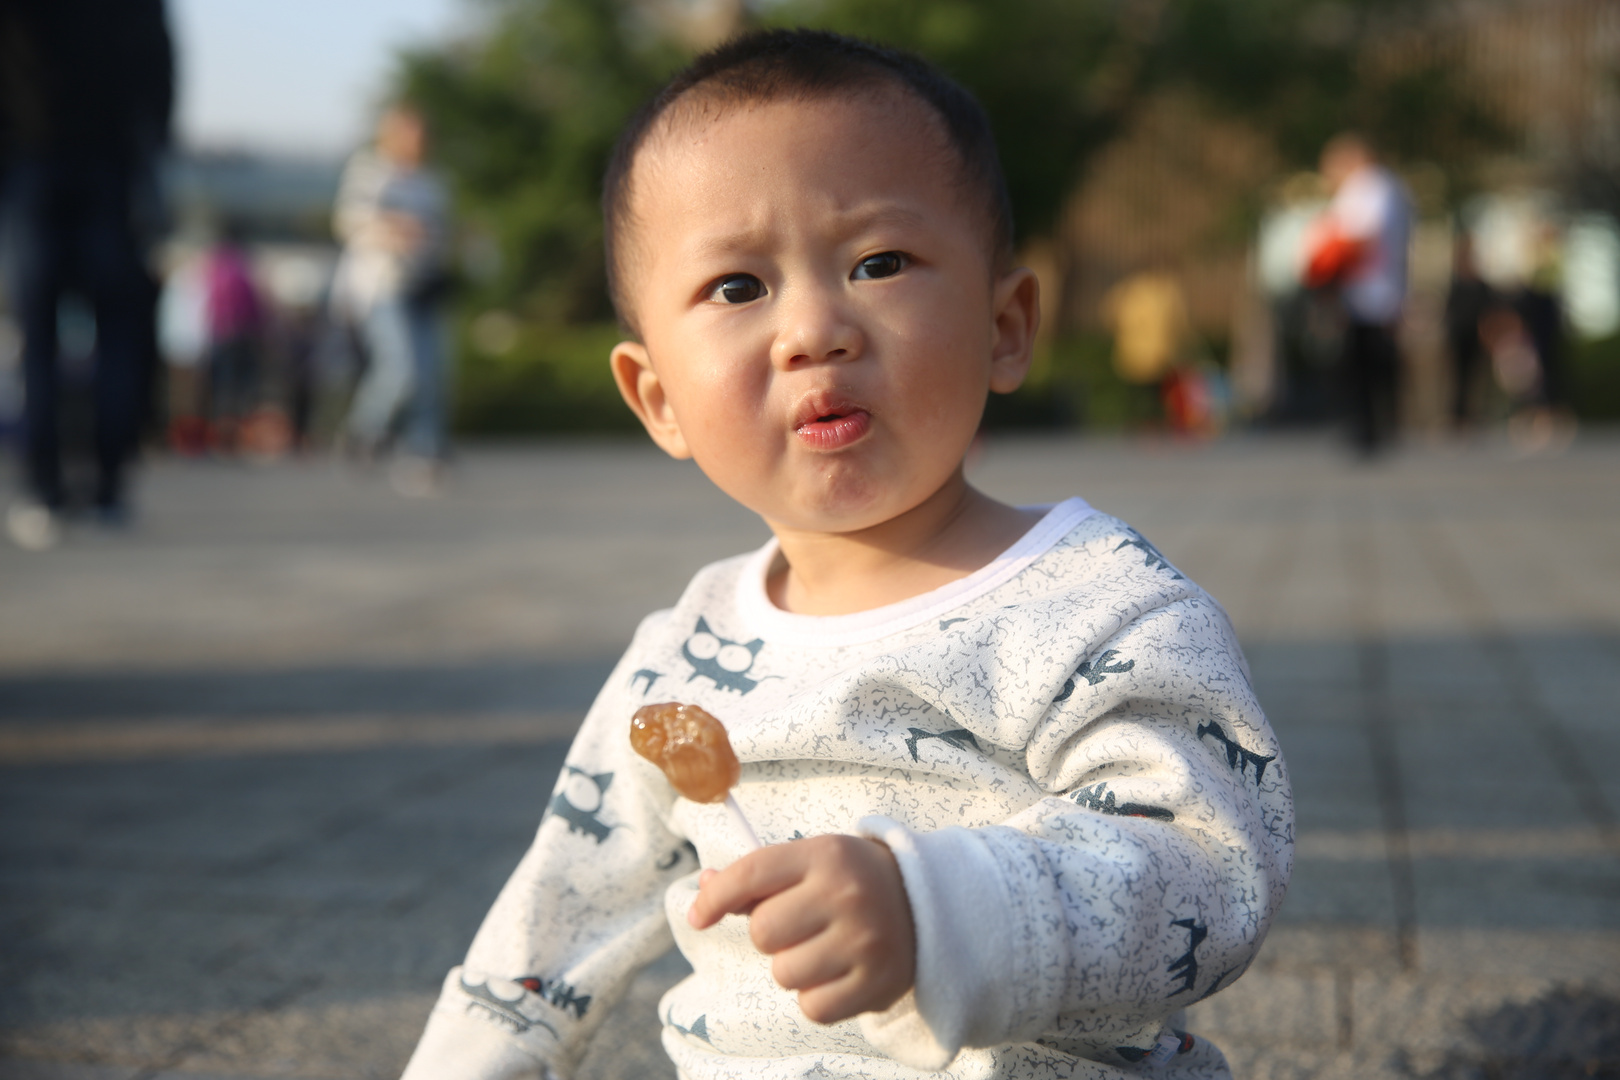 Sugar-eating children